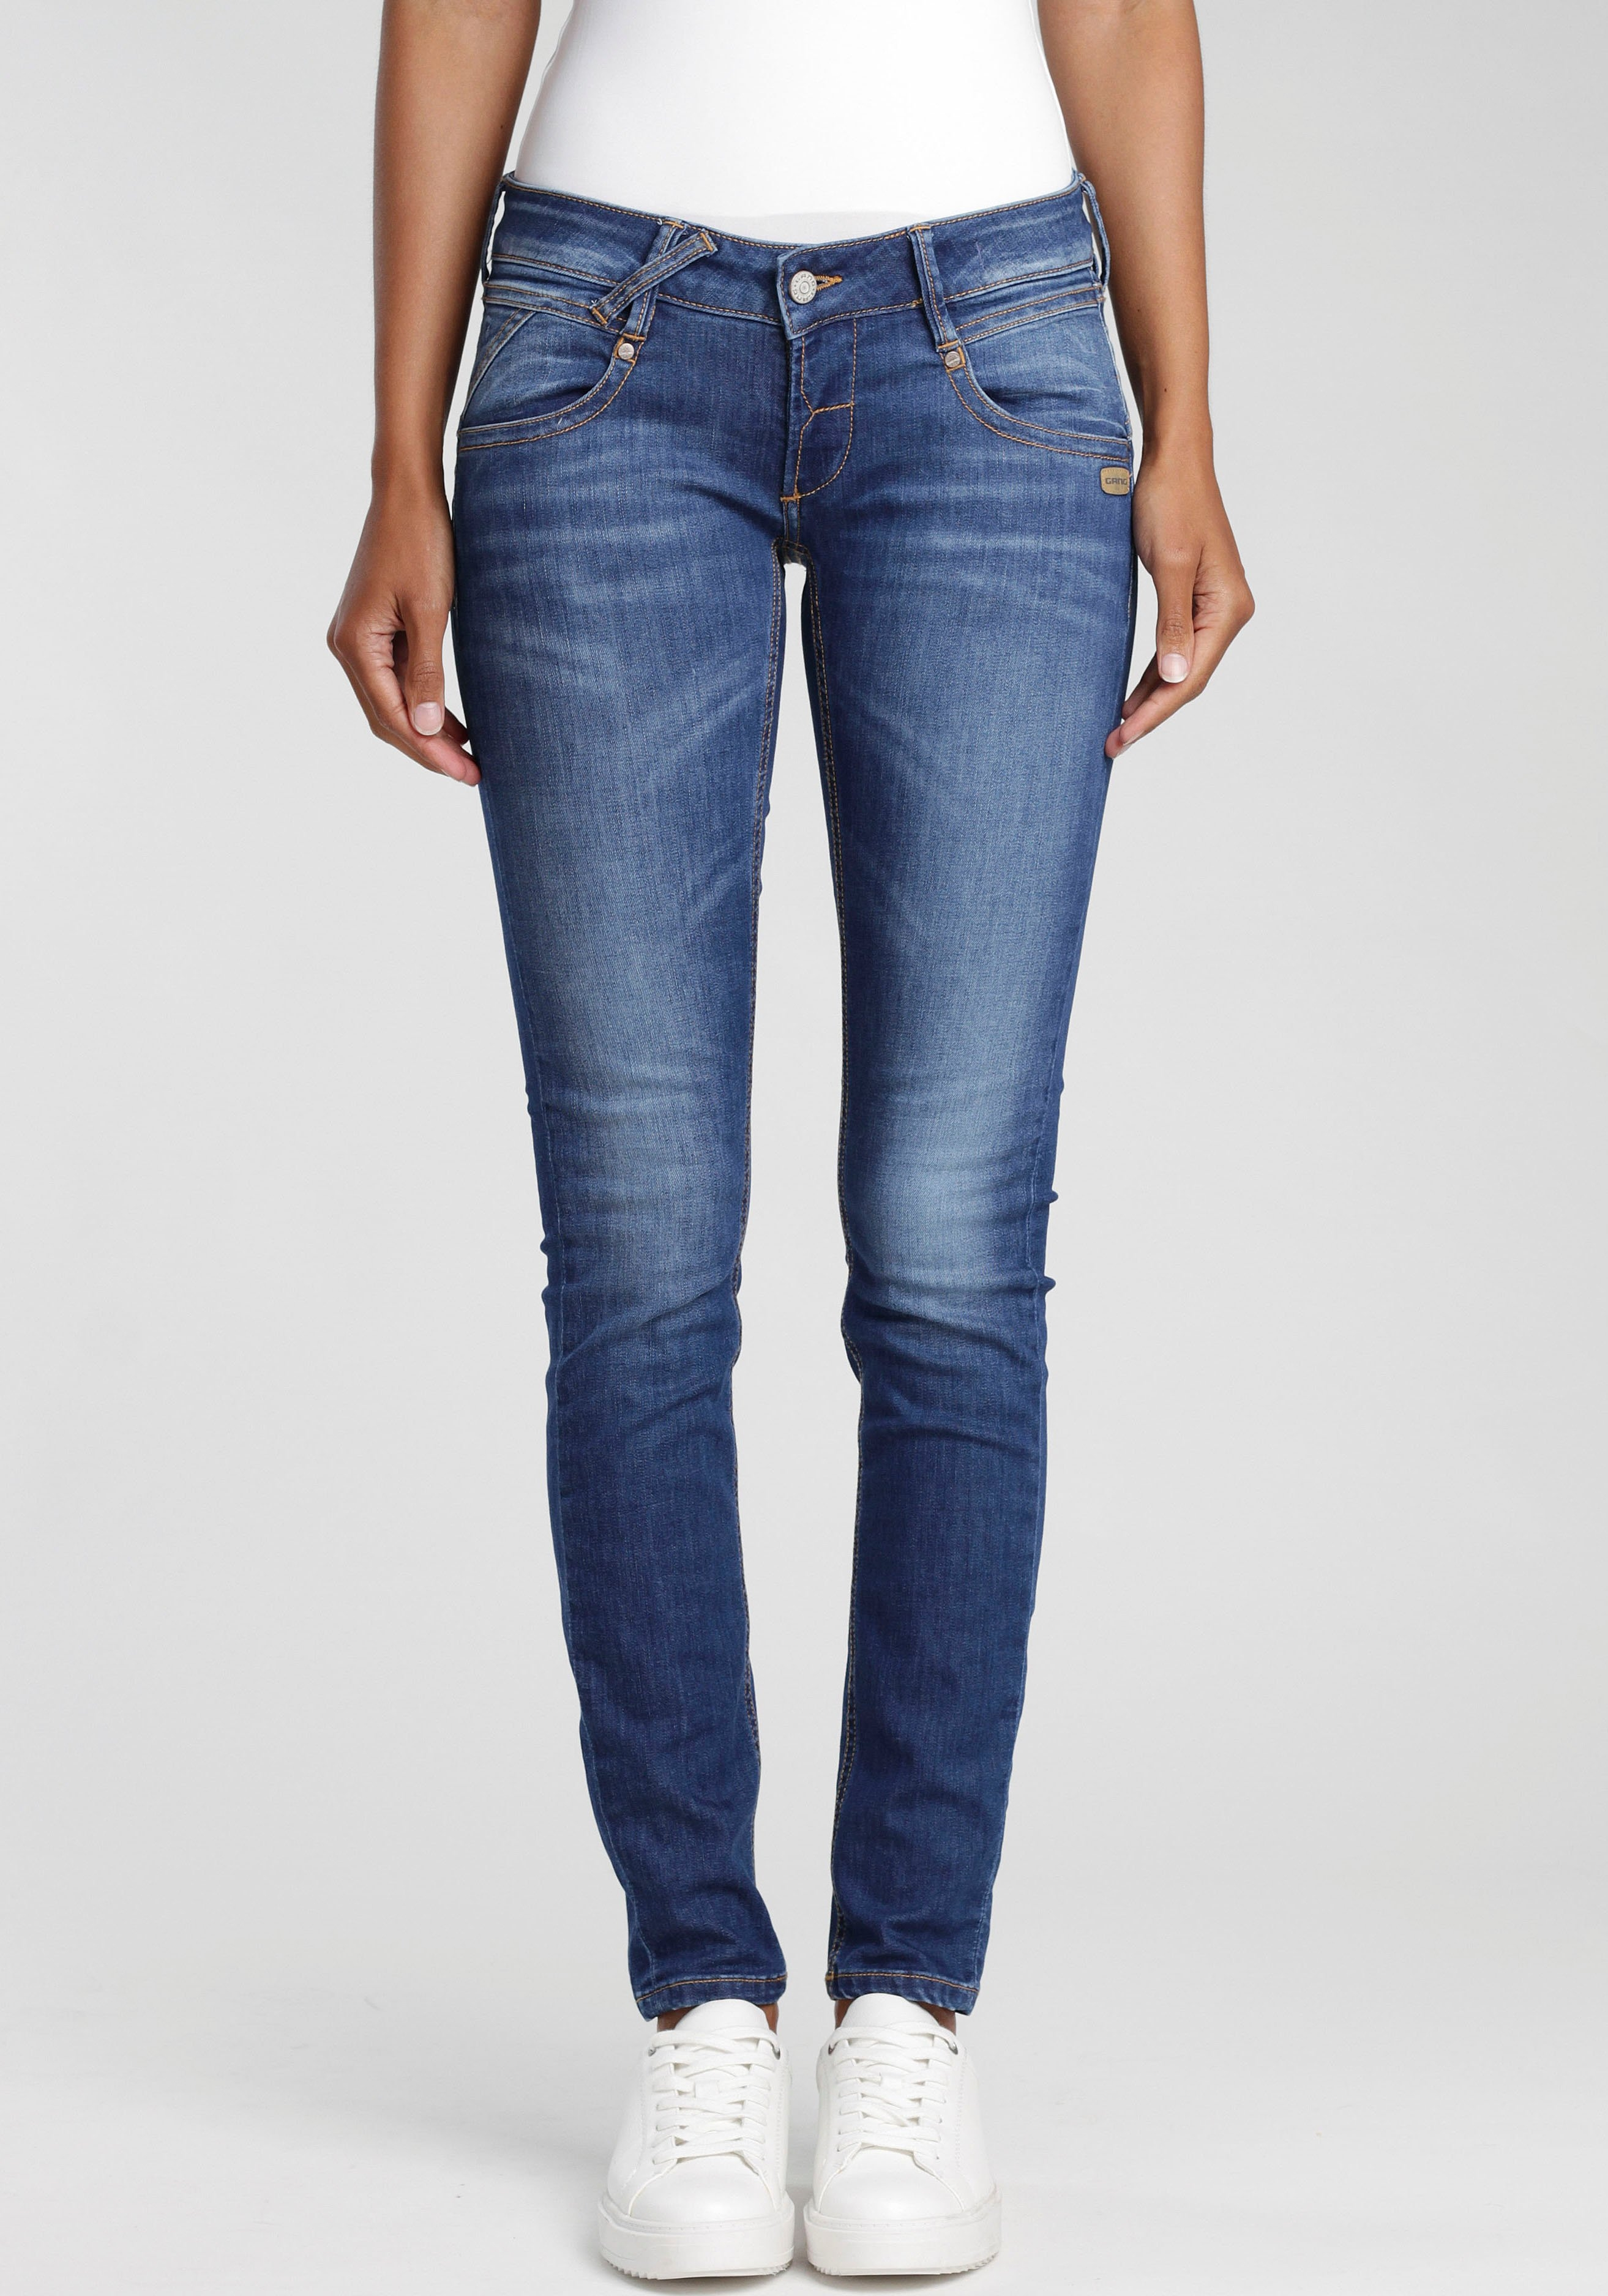 GANG skinny fit jeans Nena met coole used-effecten - gratis ruilen op otto.nl